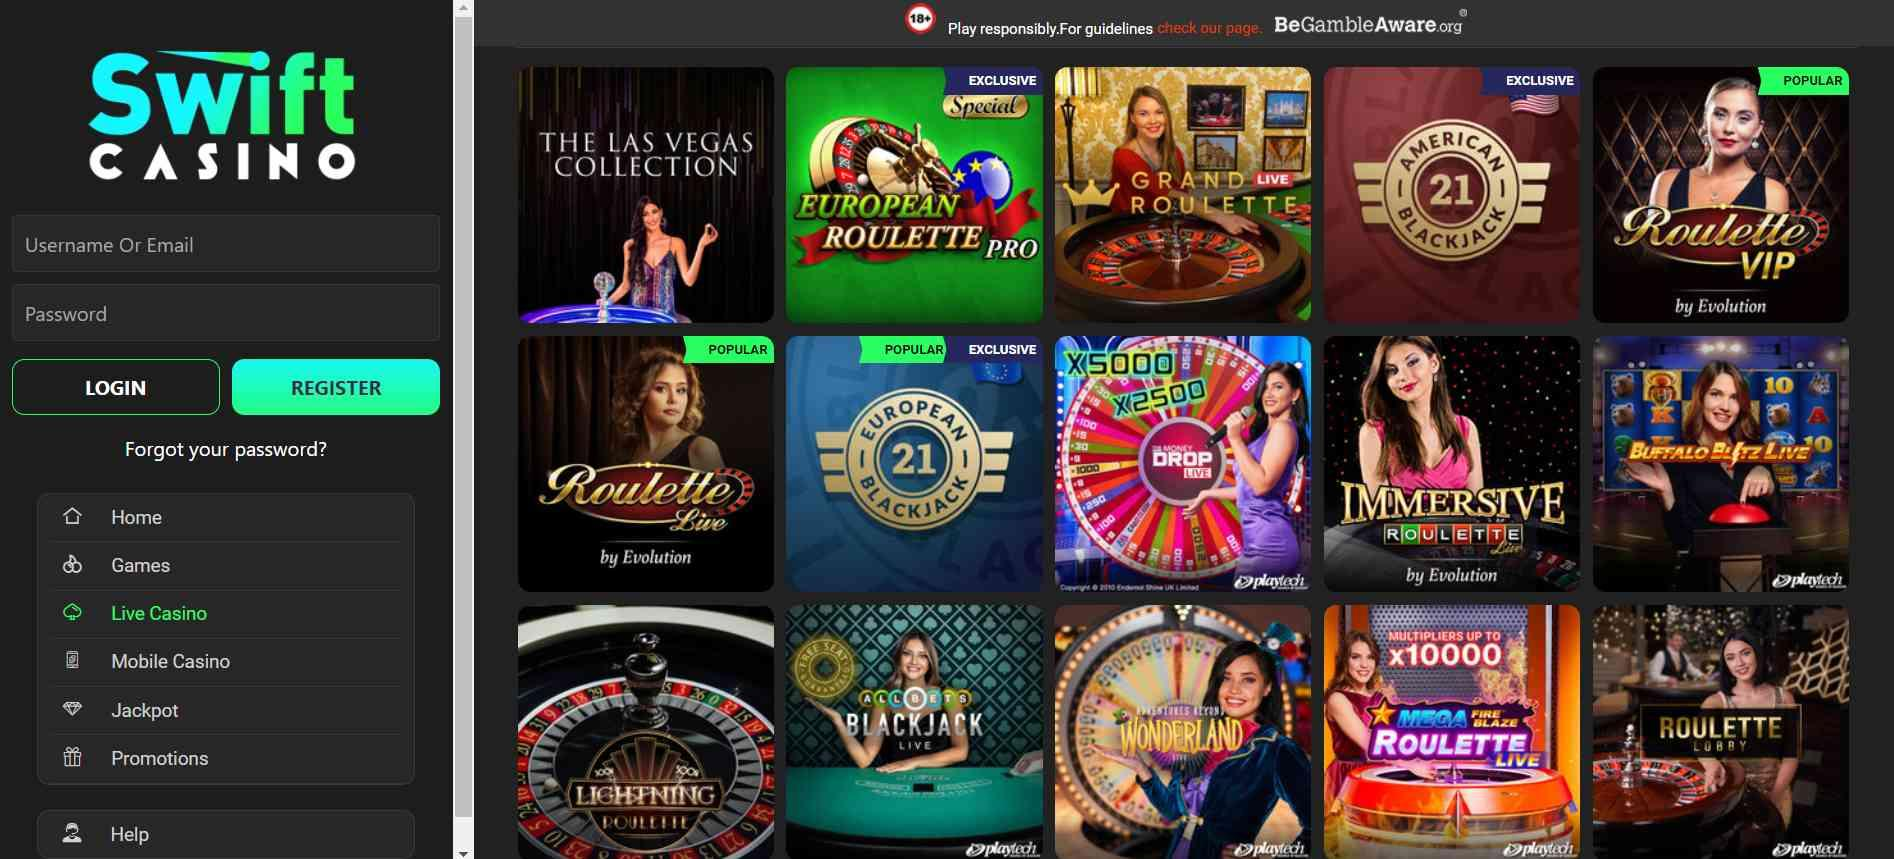 Swift Casino Live Casino Selection